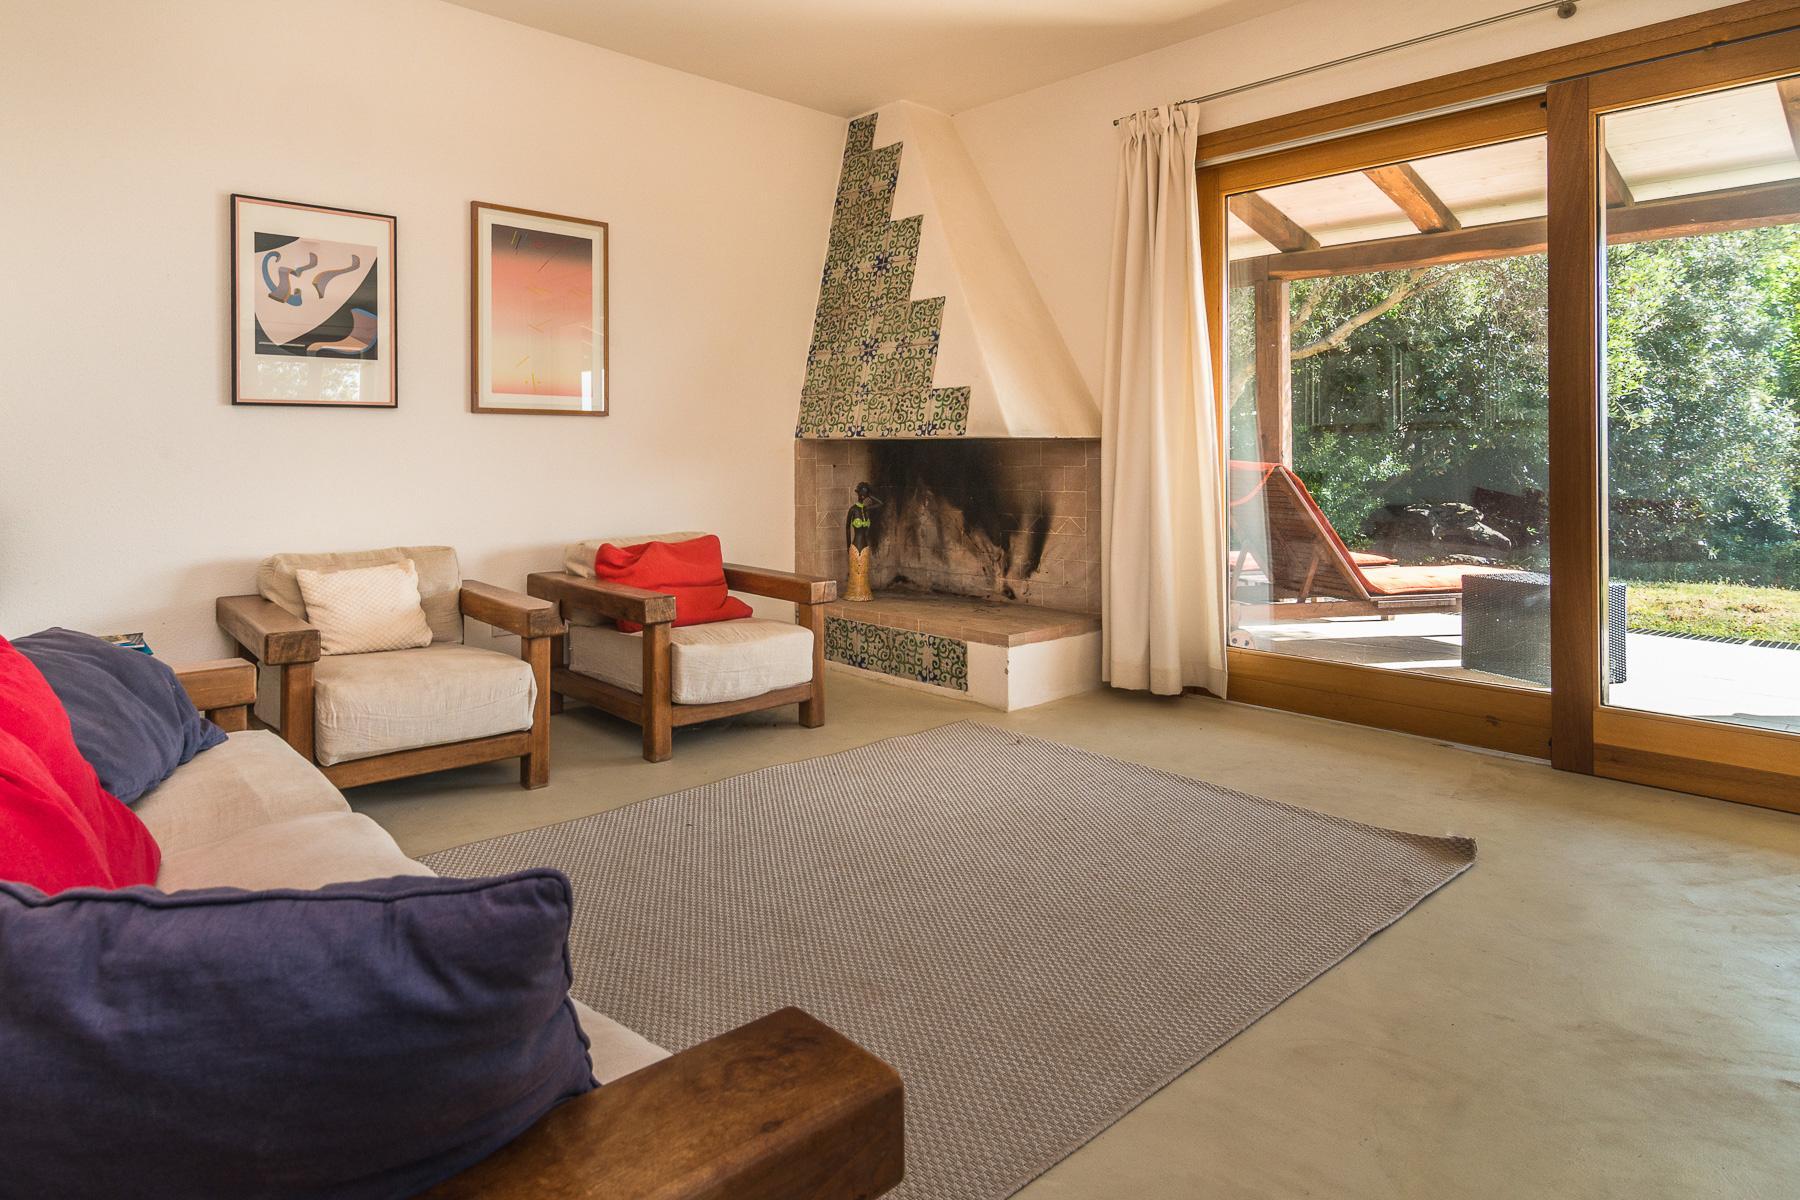 Golfo Aranci Sos Aranzos Wonderfull Villa with direct access to the beach - 15